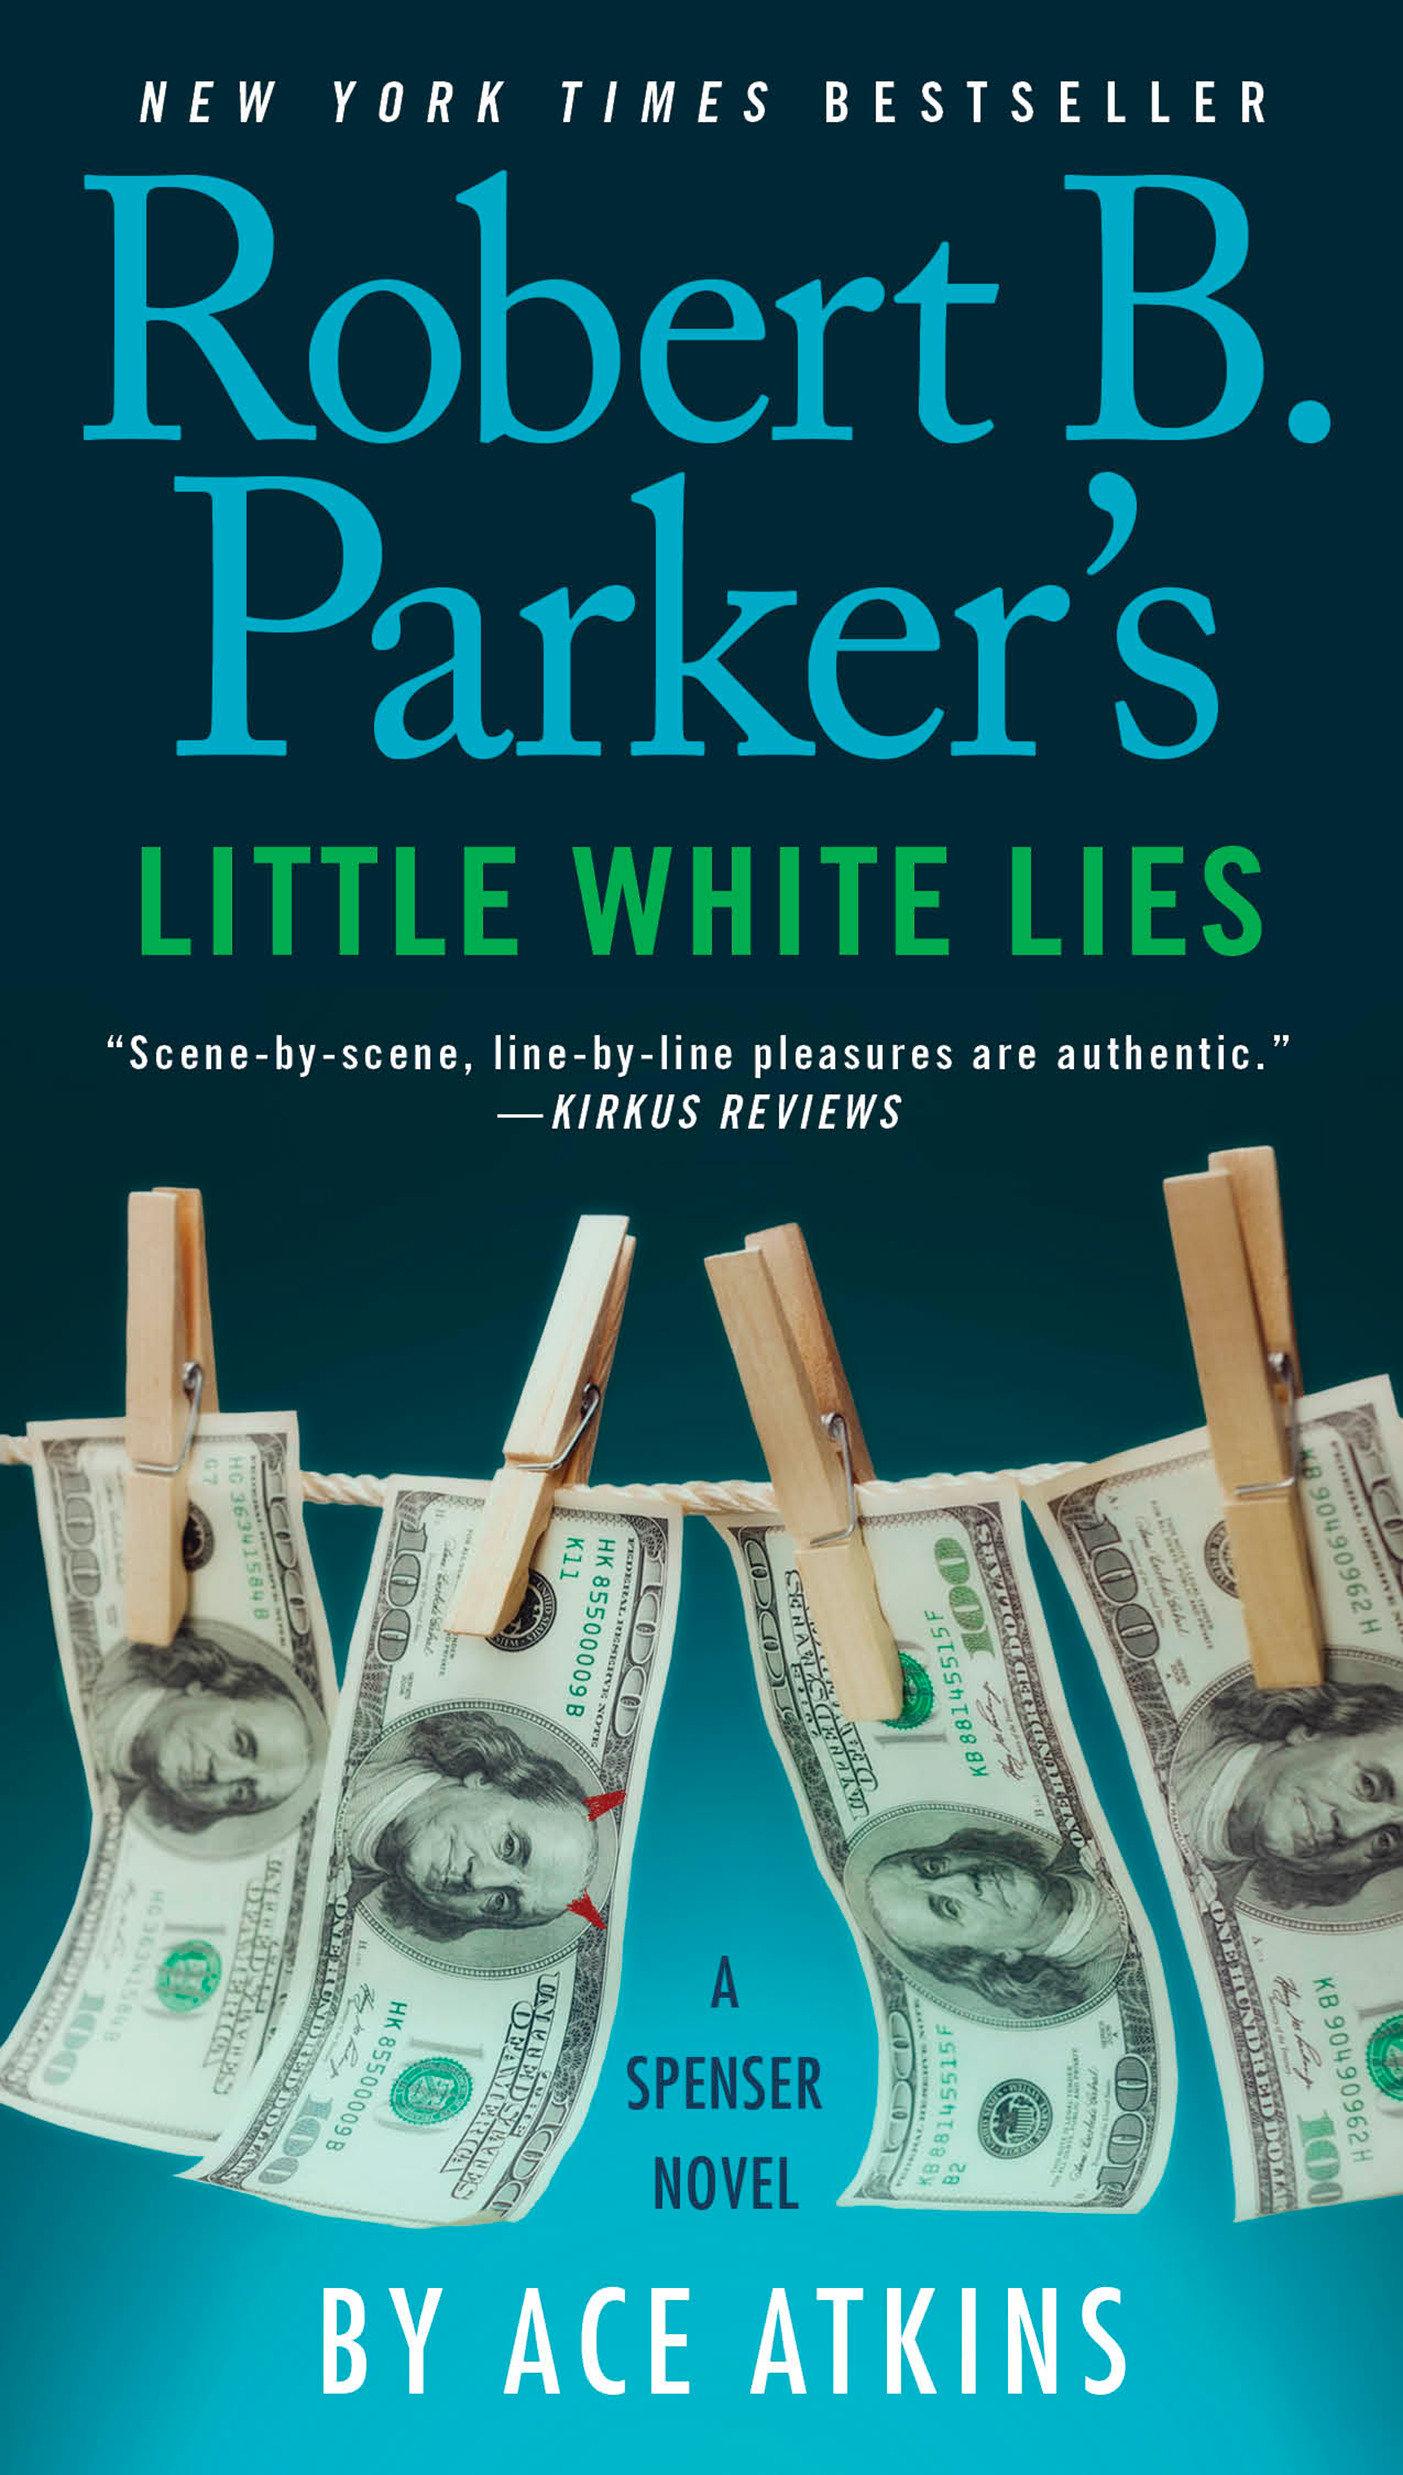 Robert B. Parker's little white lies cover image